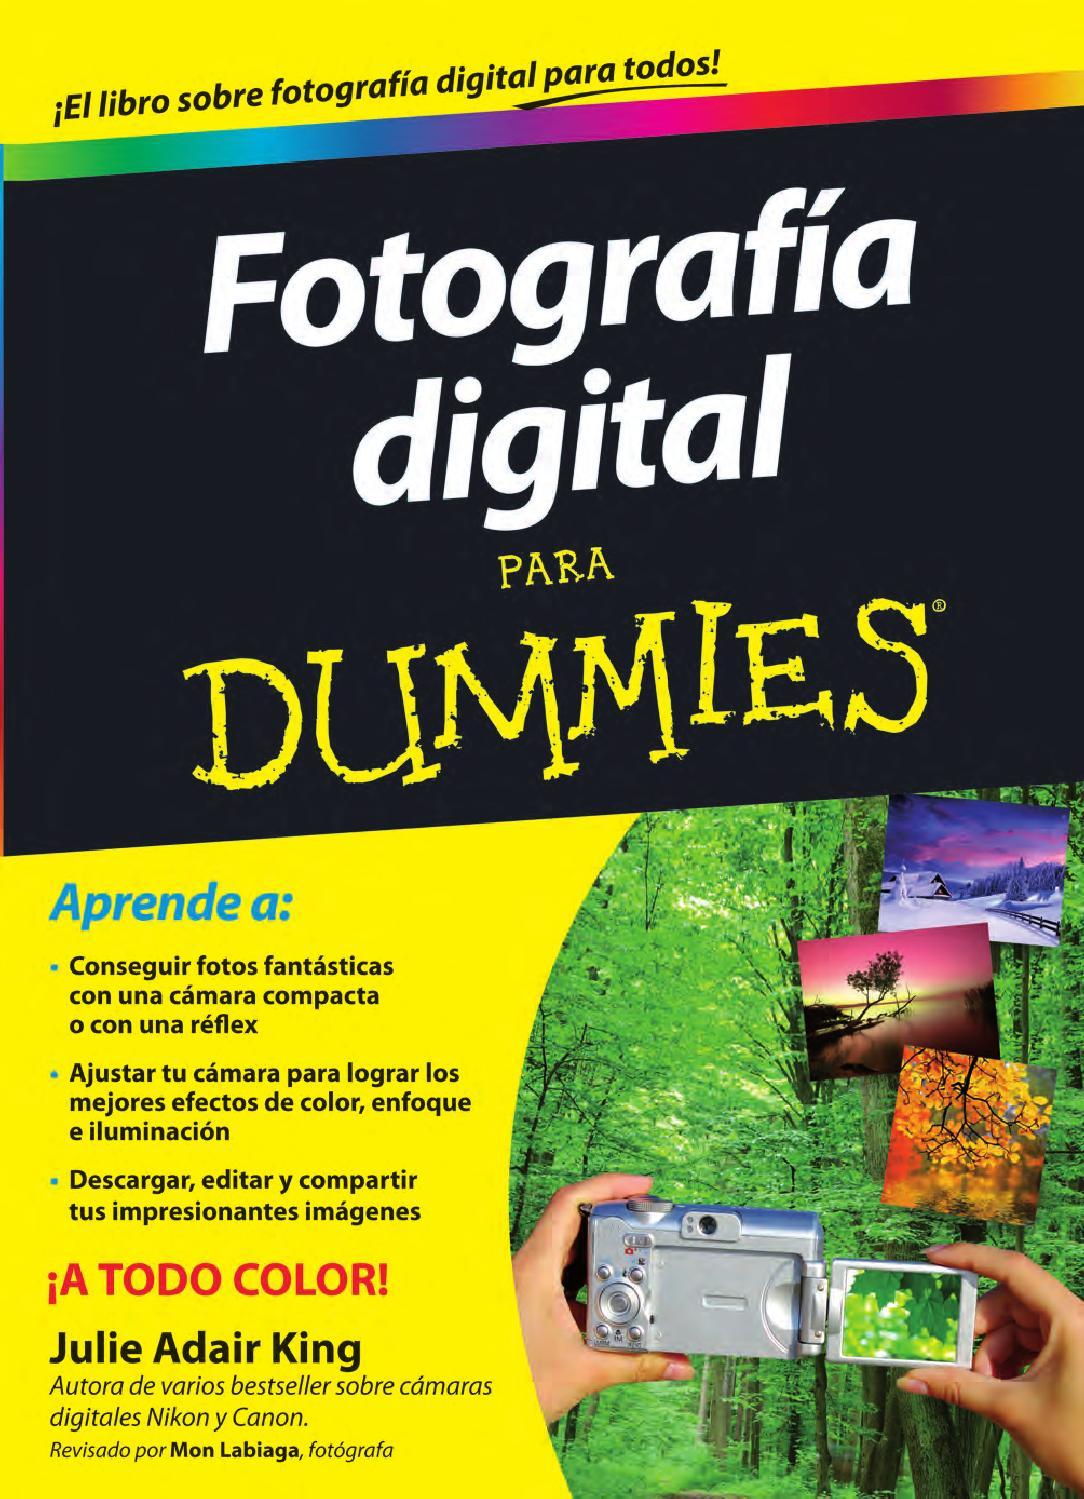 digital photography for dummies 7th edition pdf